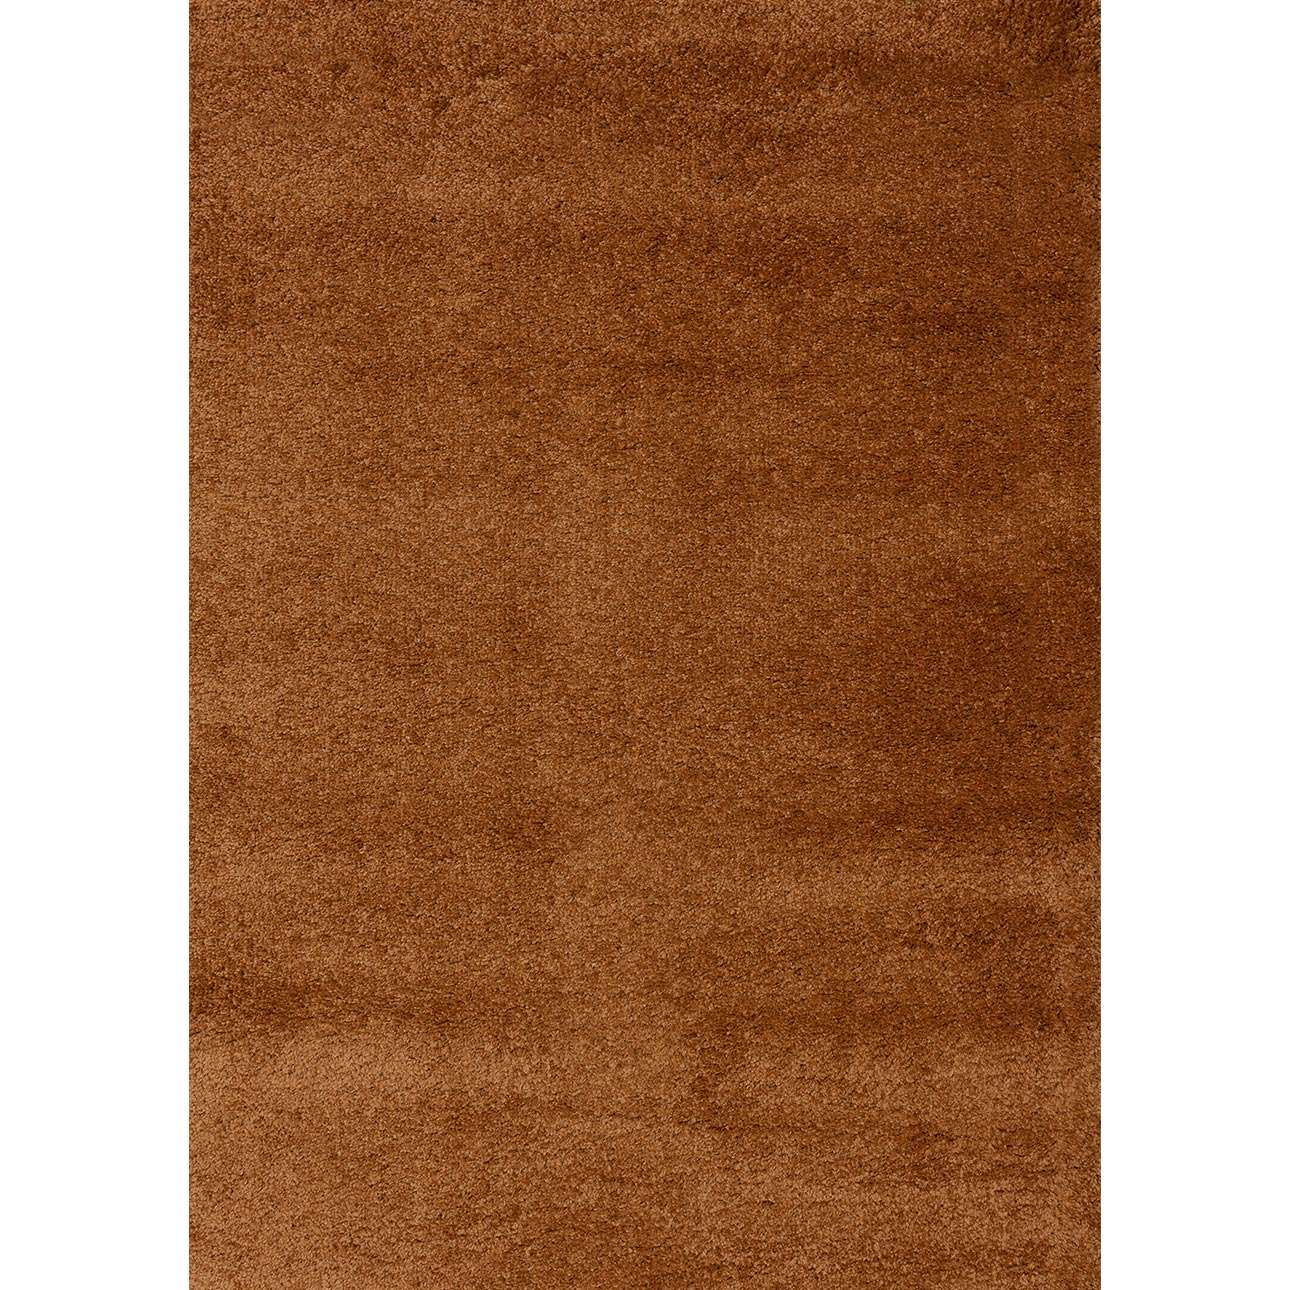 Koberec Royal Living cognac 120x170cm